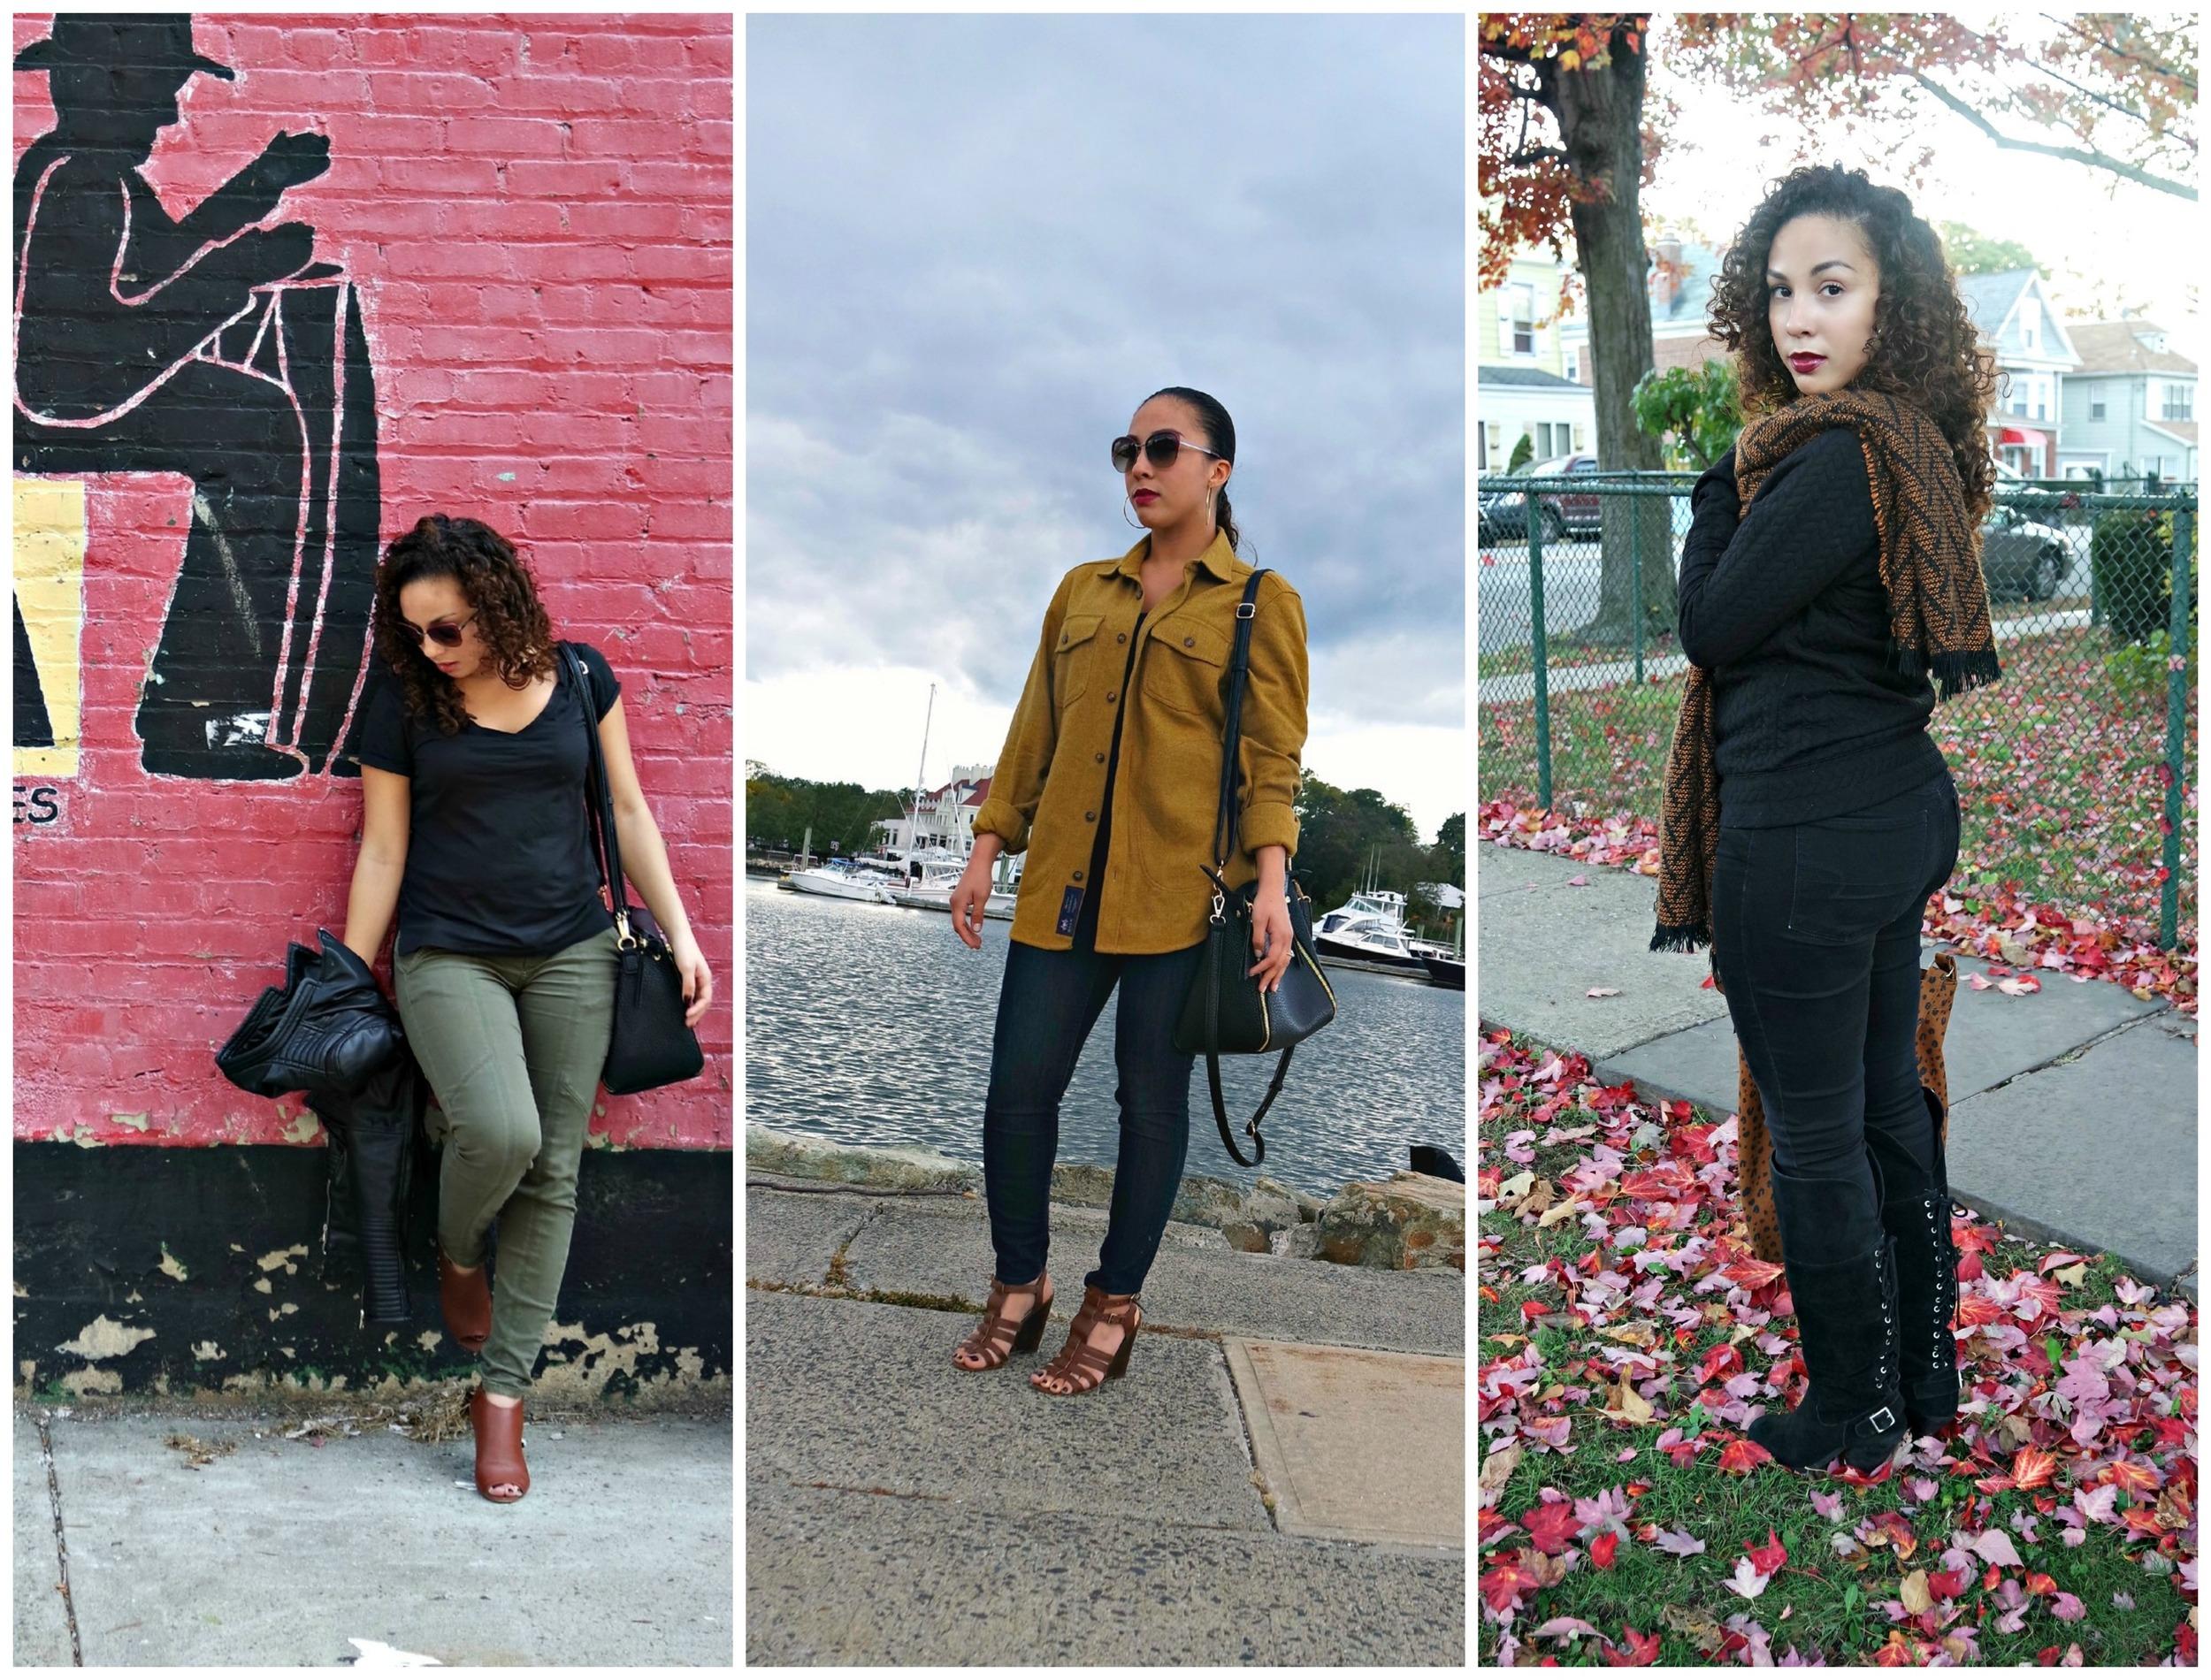 Olive Green + Black             Boyfriend Jacket               Orange + Black Blanket Scarf